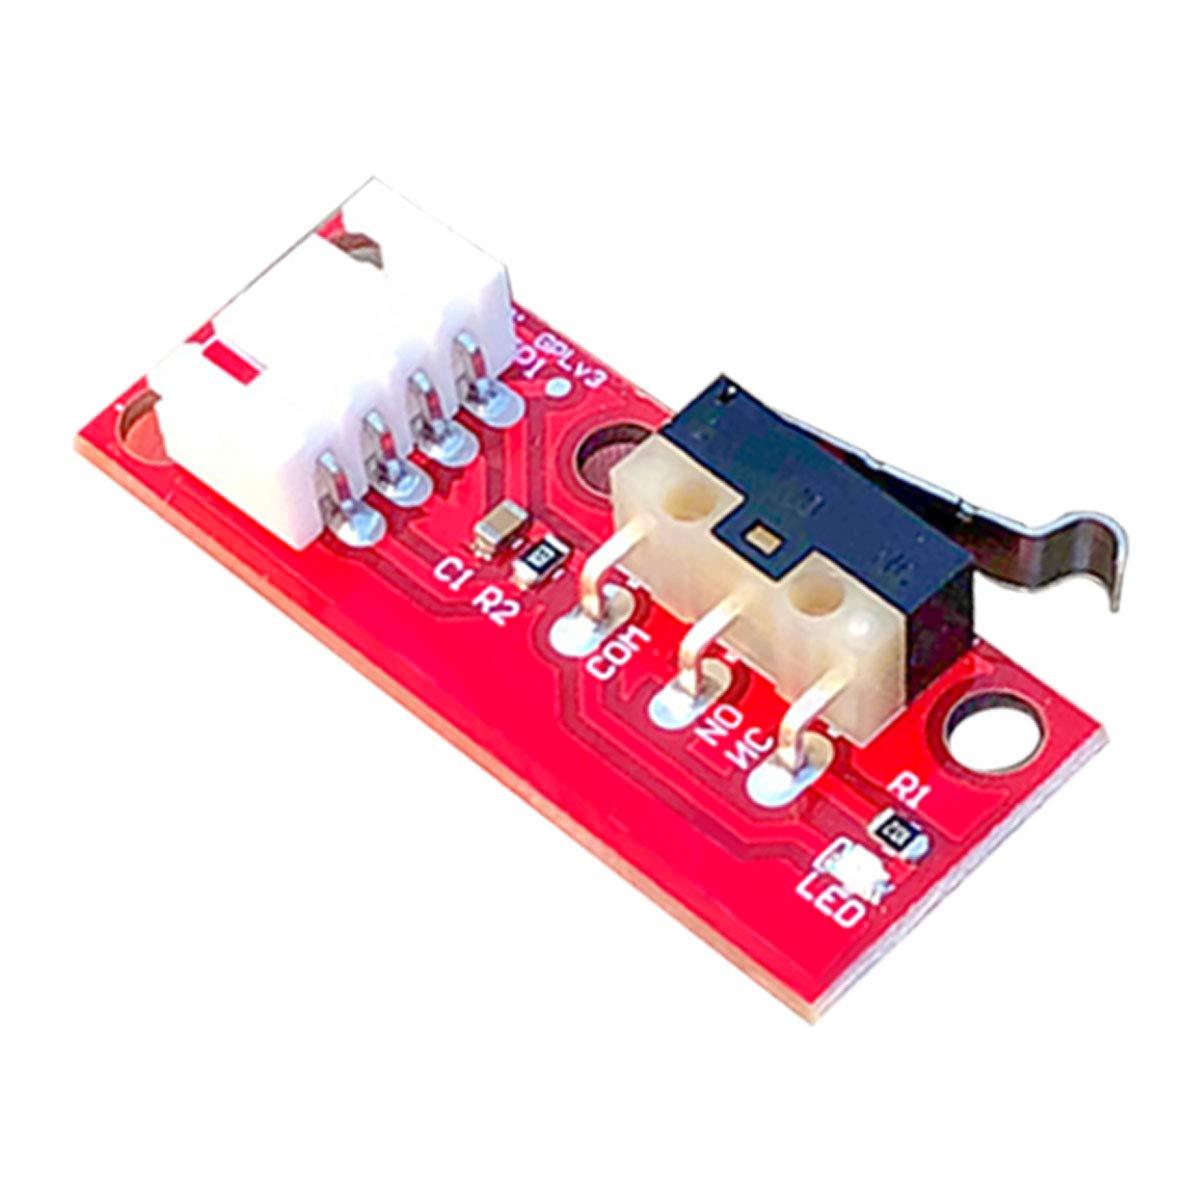 LGDehome for ArduinoIDE Mini Nano V3.0 ATmega328P 5V 16M Micro Controller Board Module with USB Cable for Arduino 10PCS